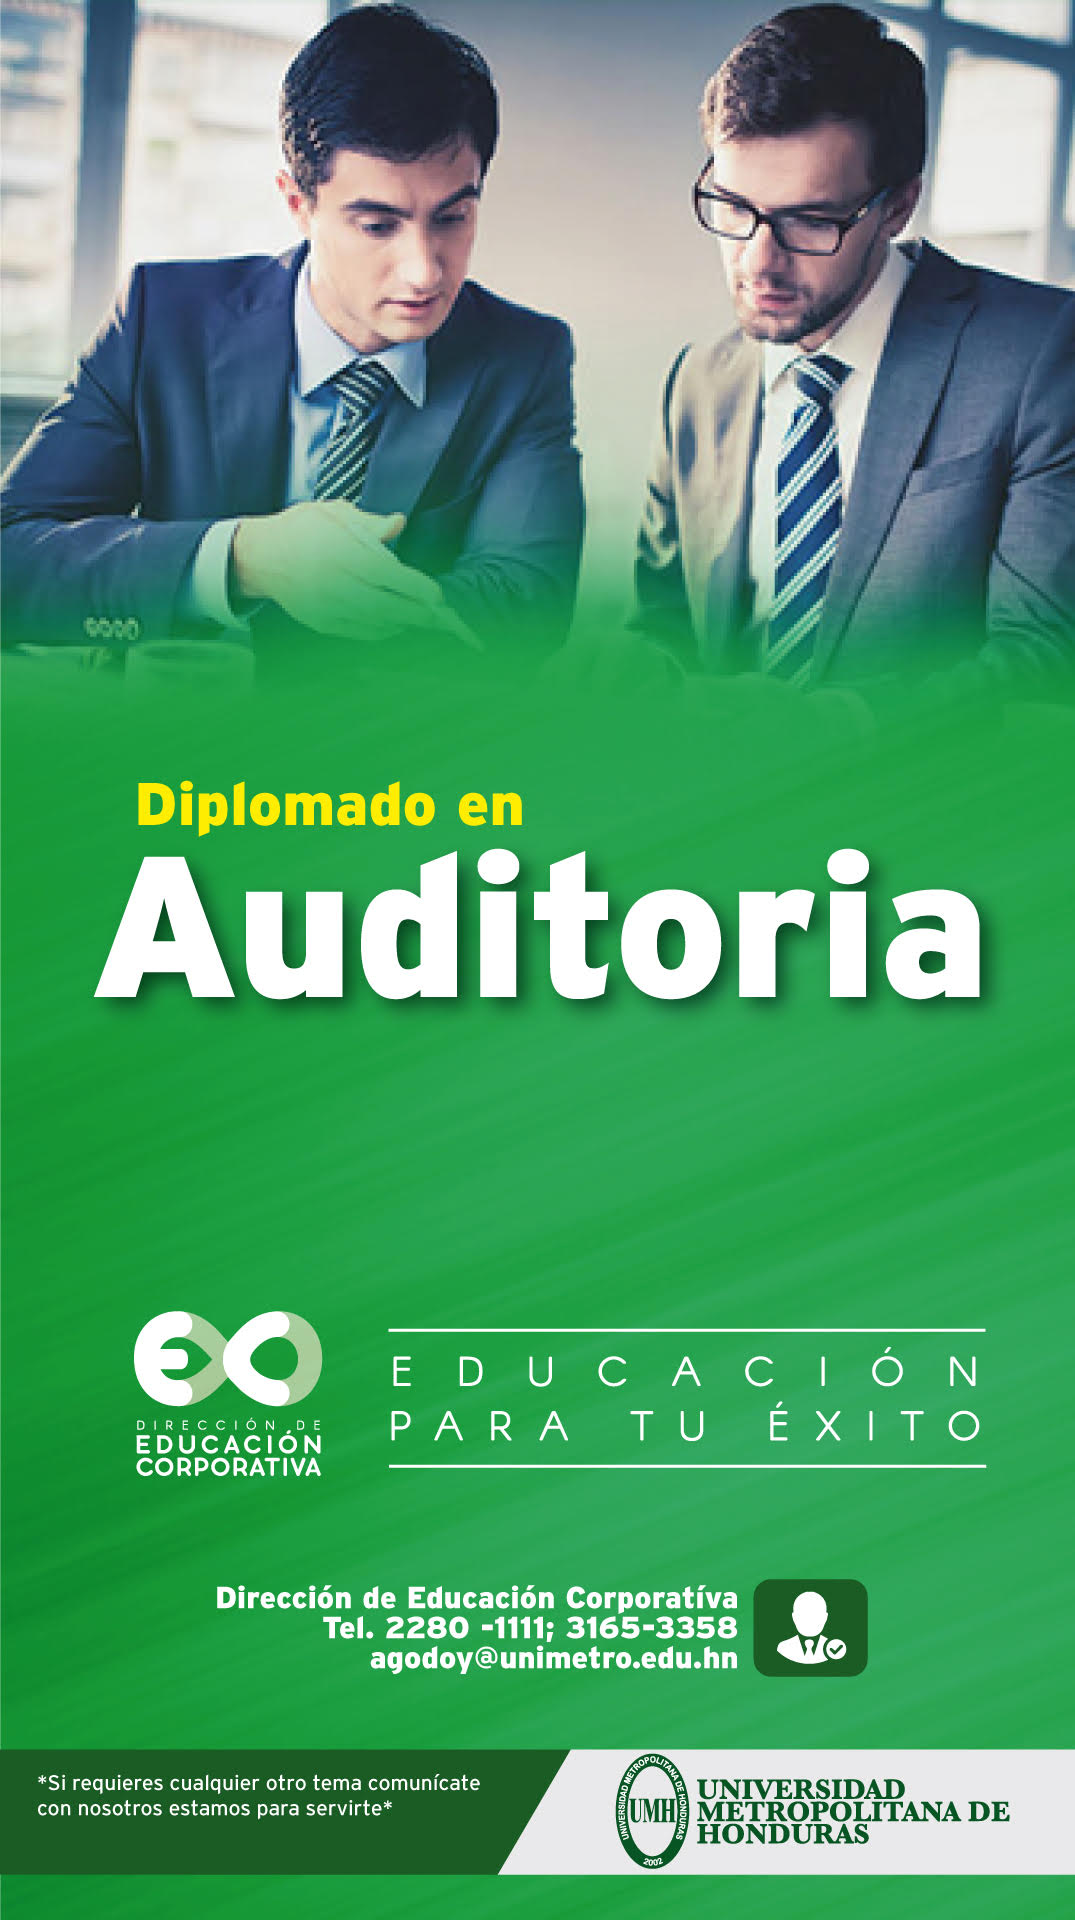 Diplomado de Auditoria